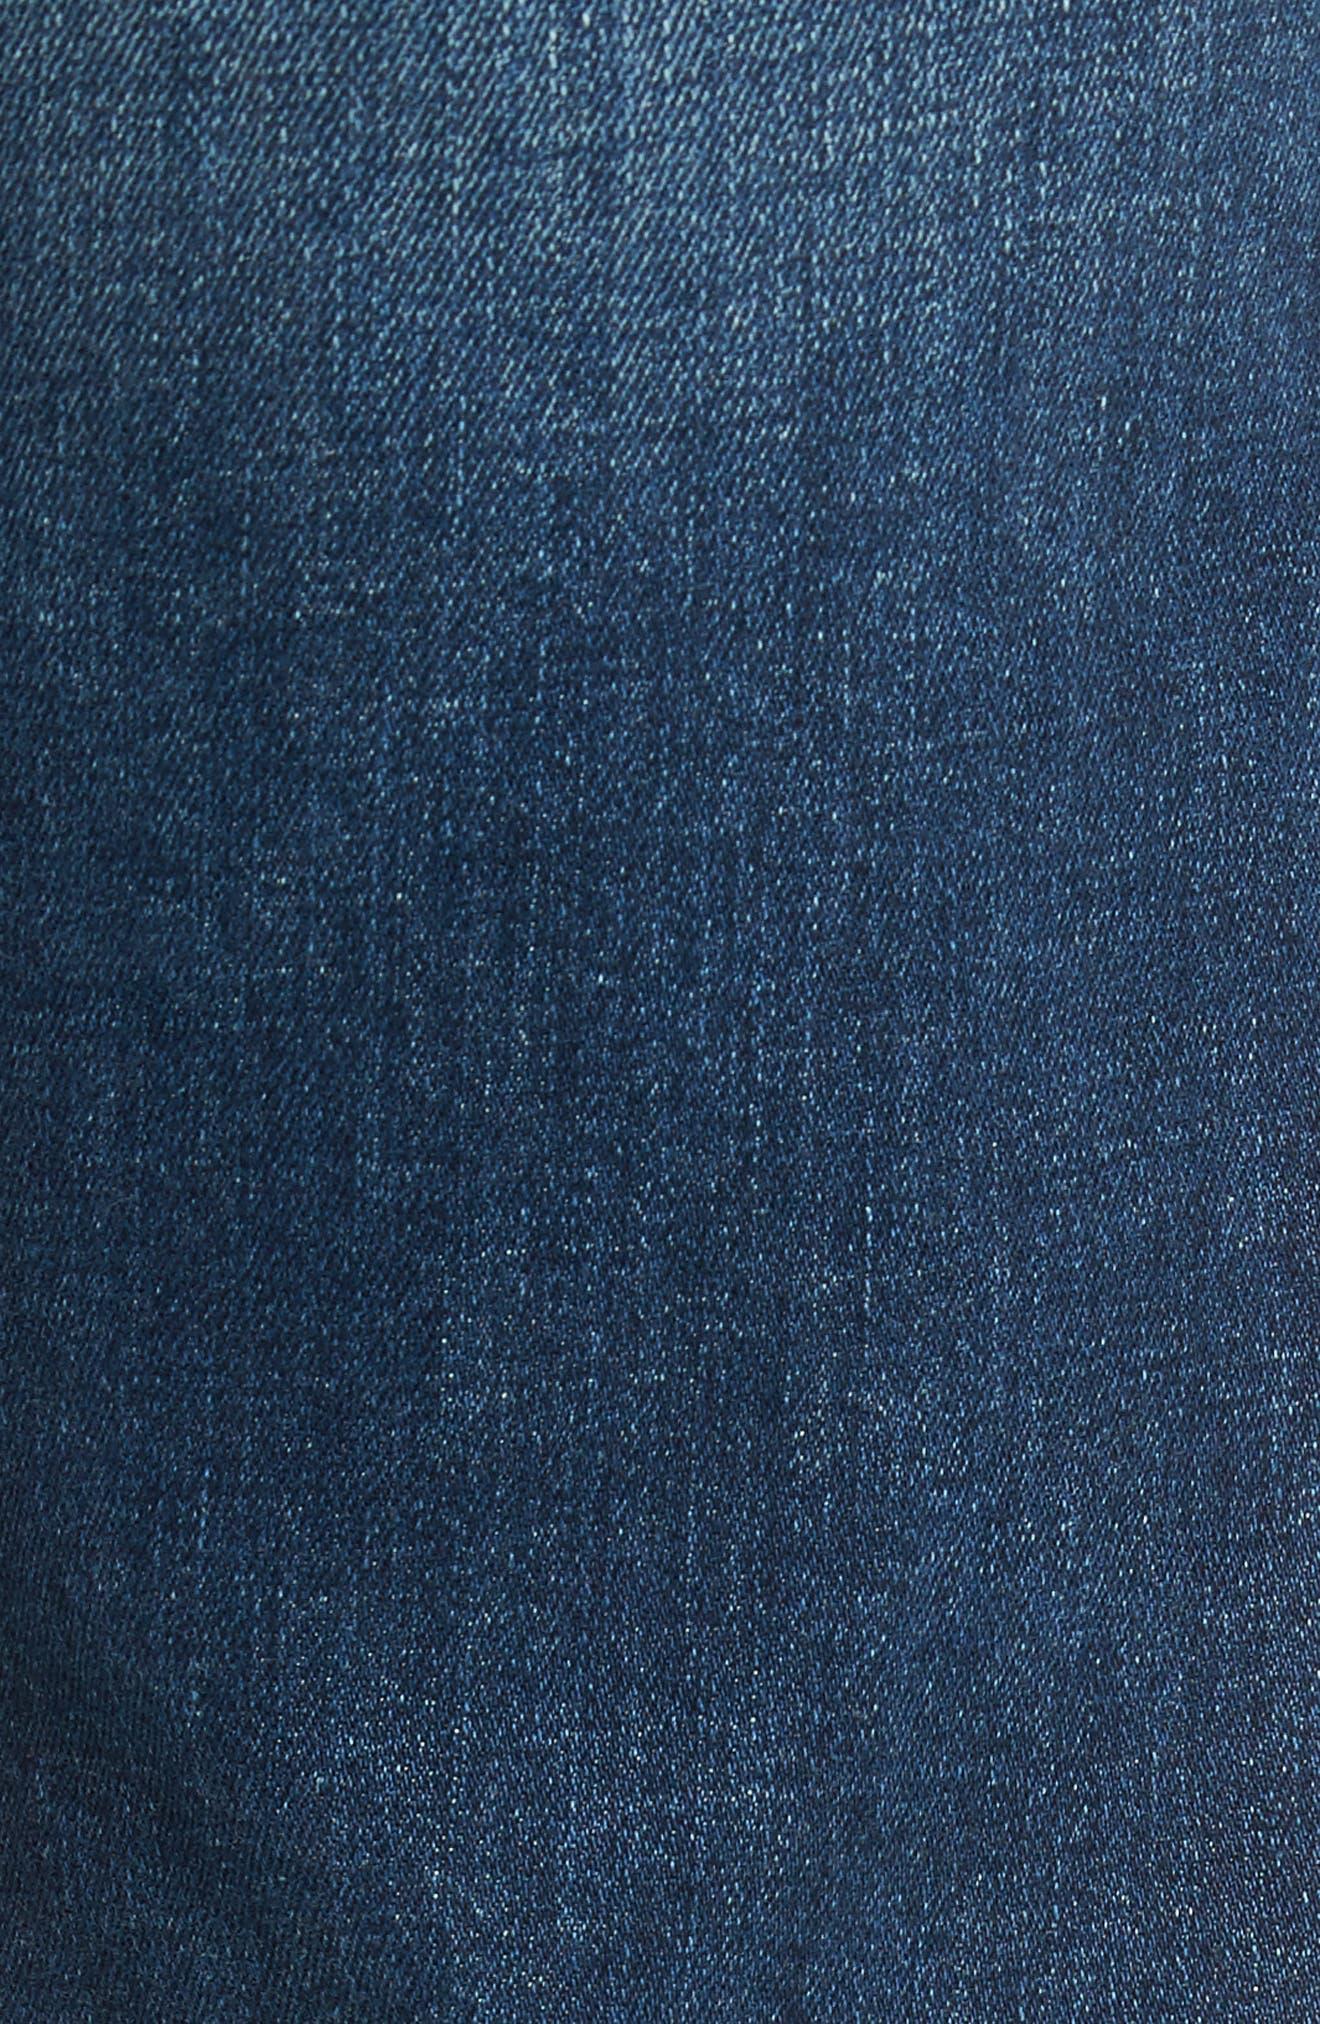 L'Homme Slim Fit Jeans,                             Alternate thumbnail 5, color,                             Salt Lake